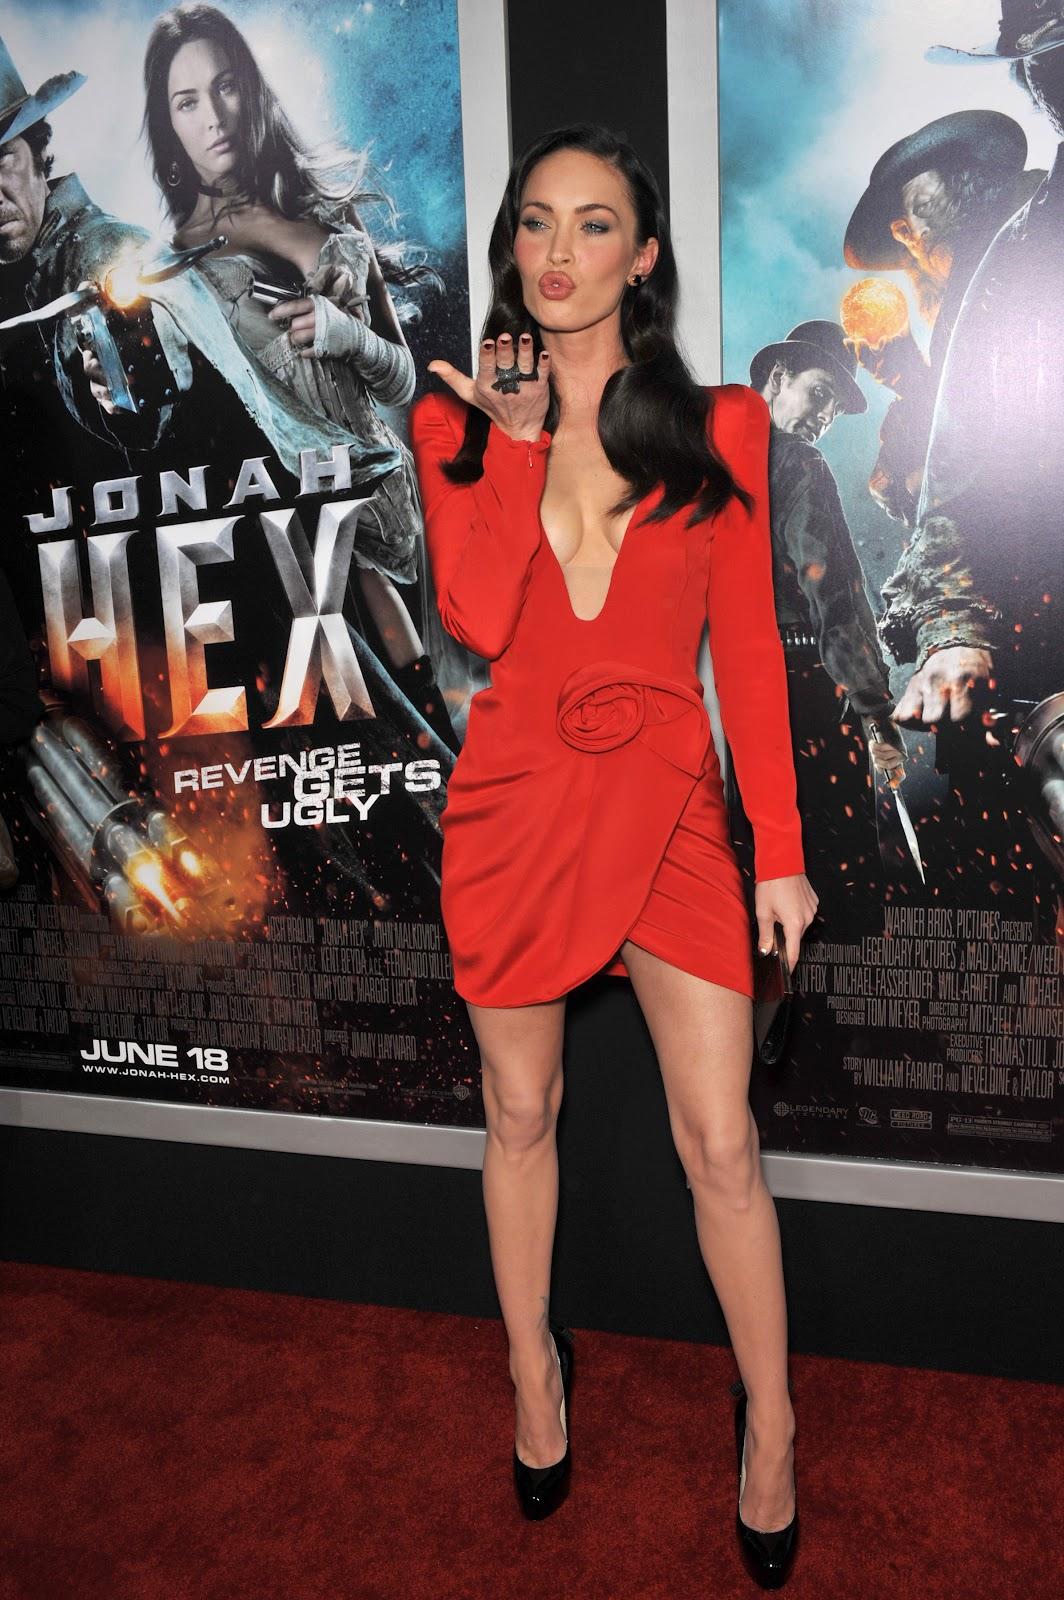 Megan Fox Hot in Red D...